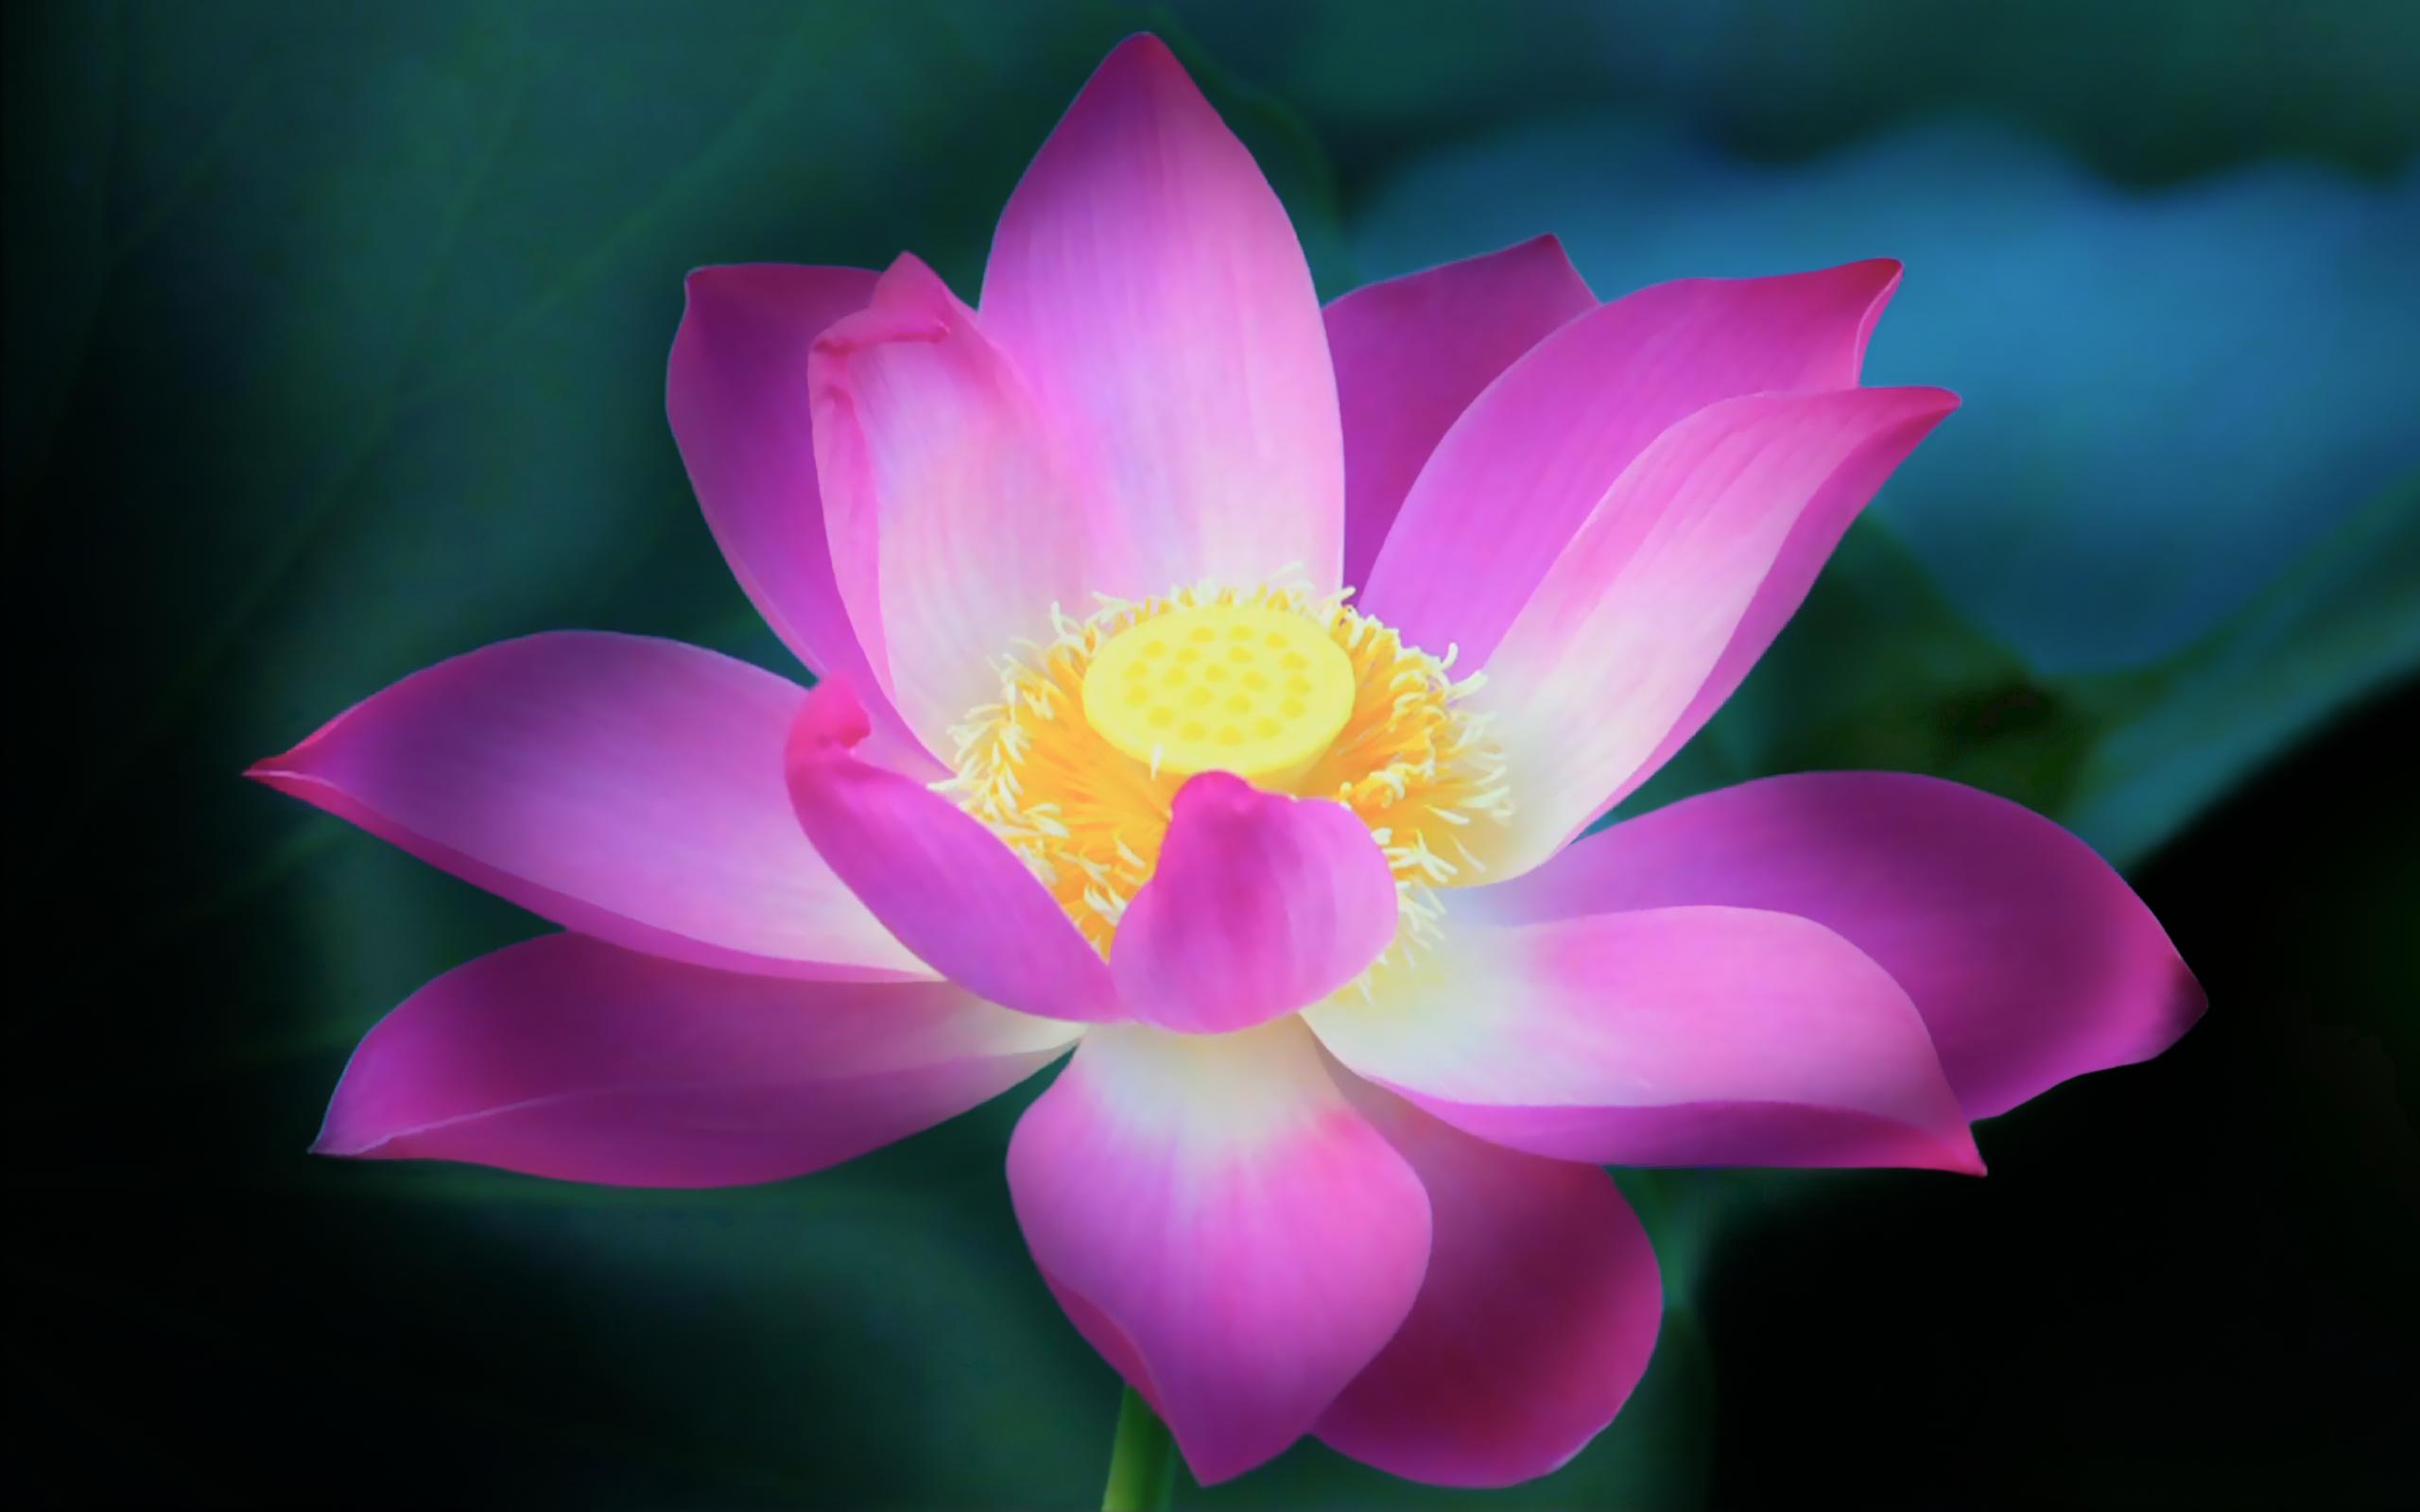 Lotus Flower Hdr Mac Os Lion By Fatamorgana2012 On Deviantart